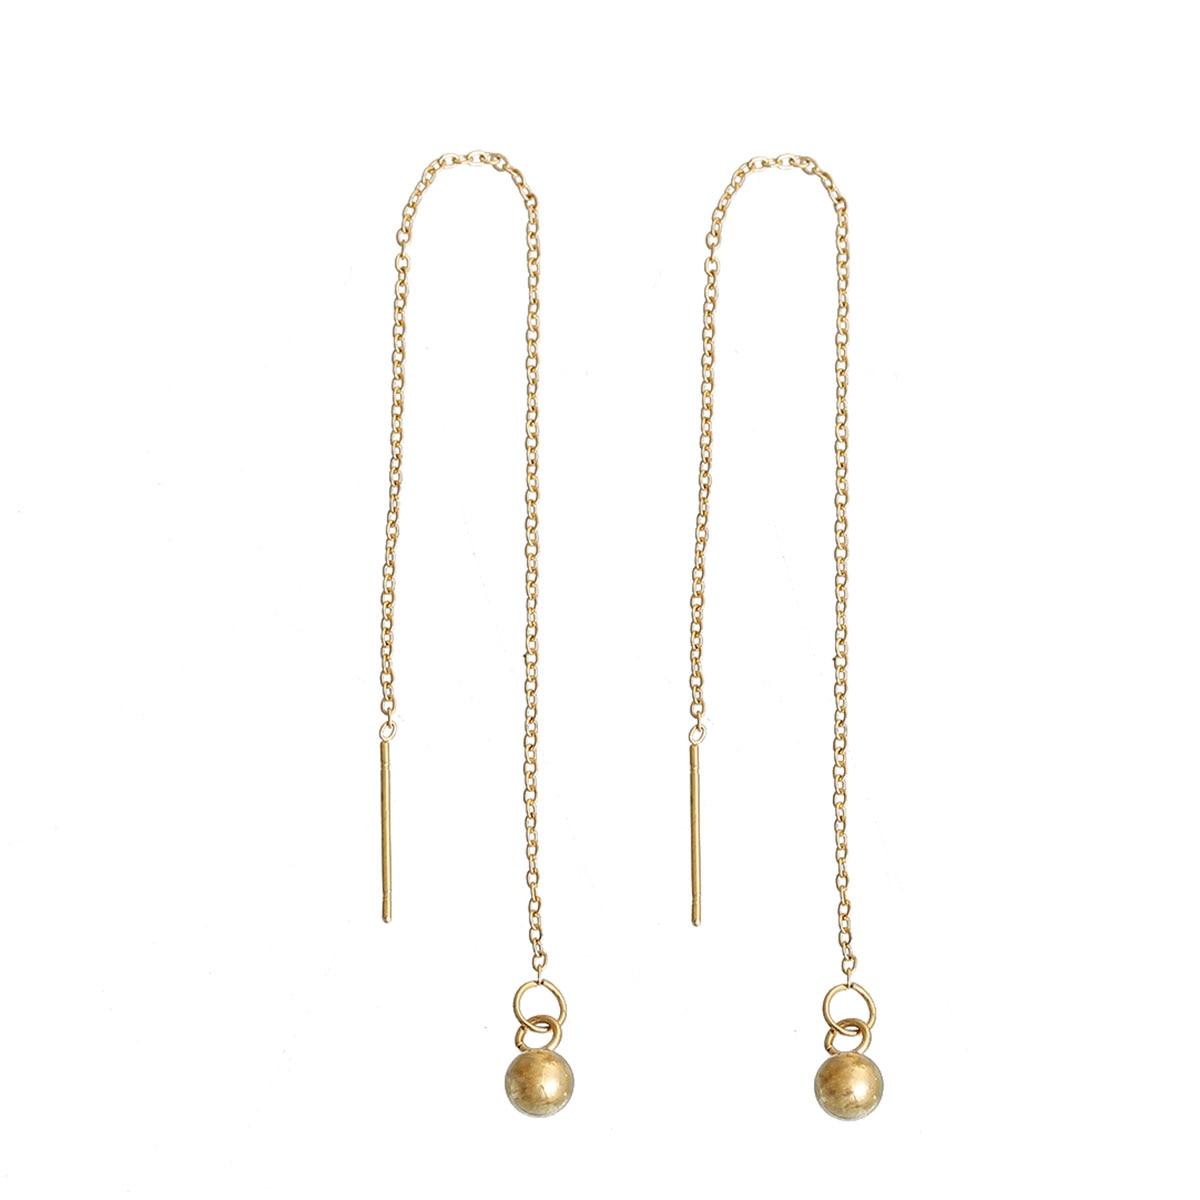 Doreen Box Stainless Steel Ear Thread Threader Earring Gold Color Ball  139cm Long,1